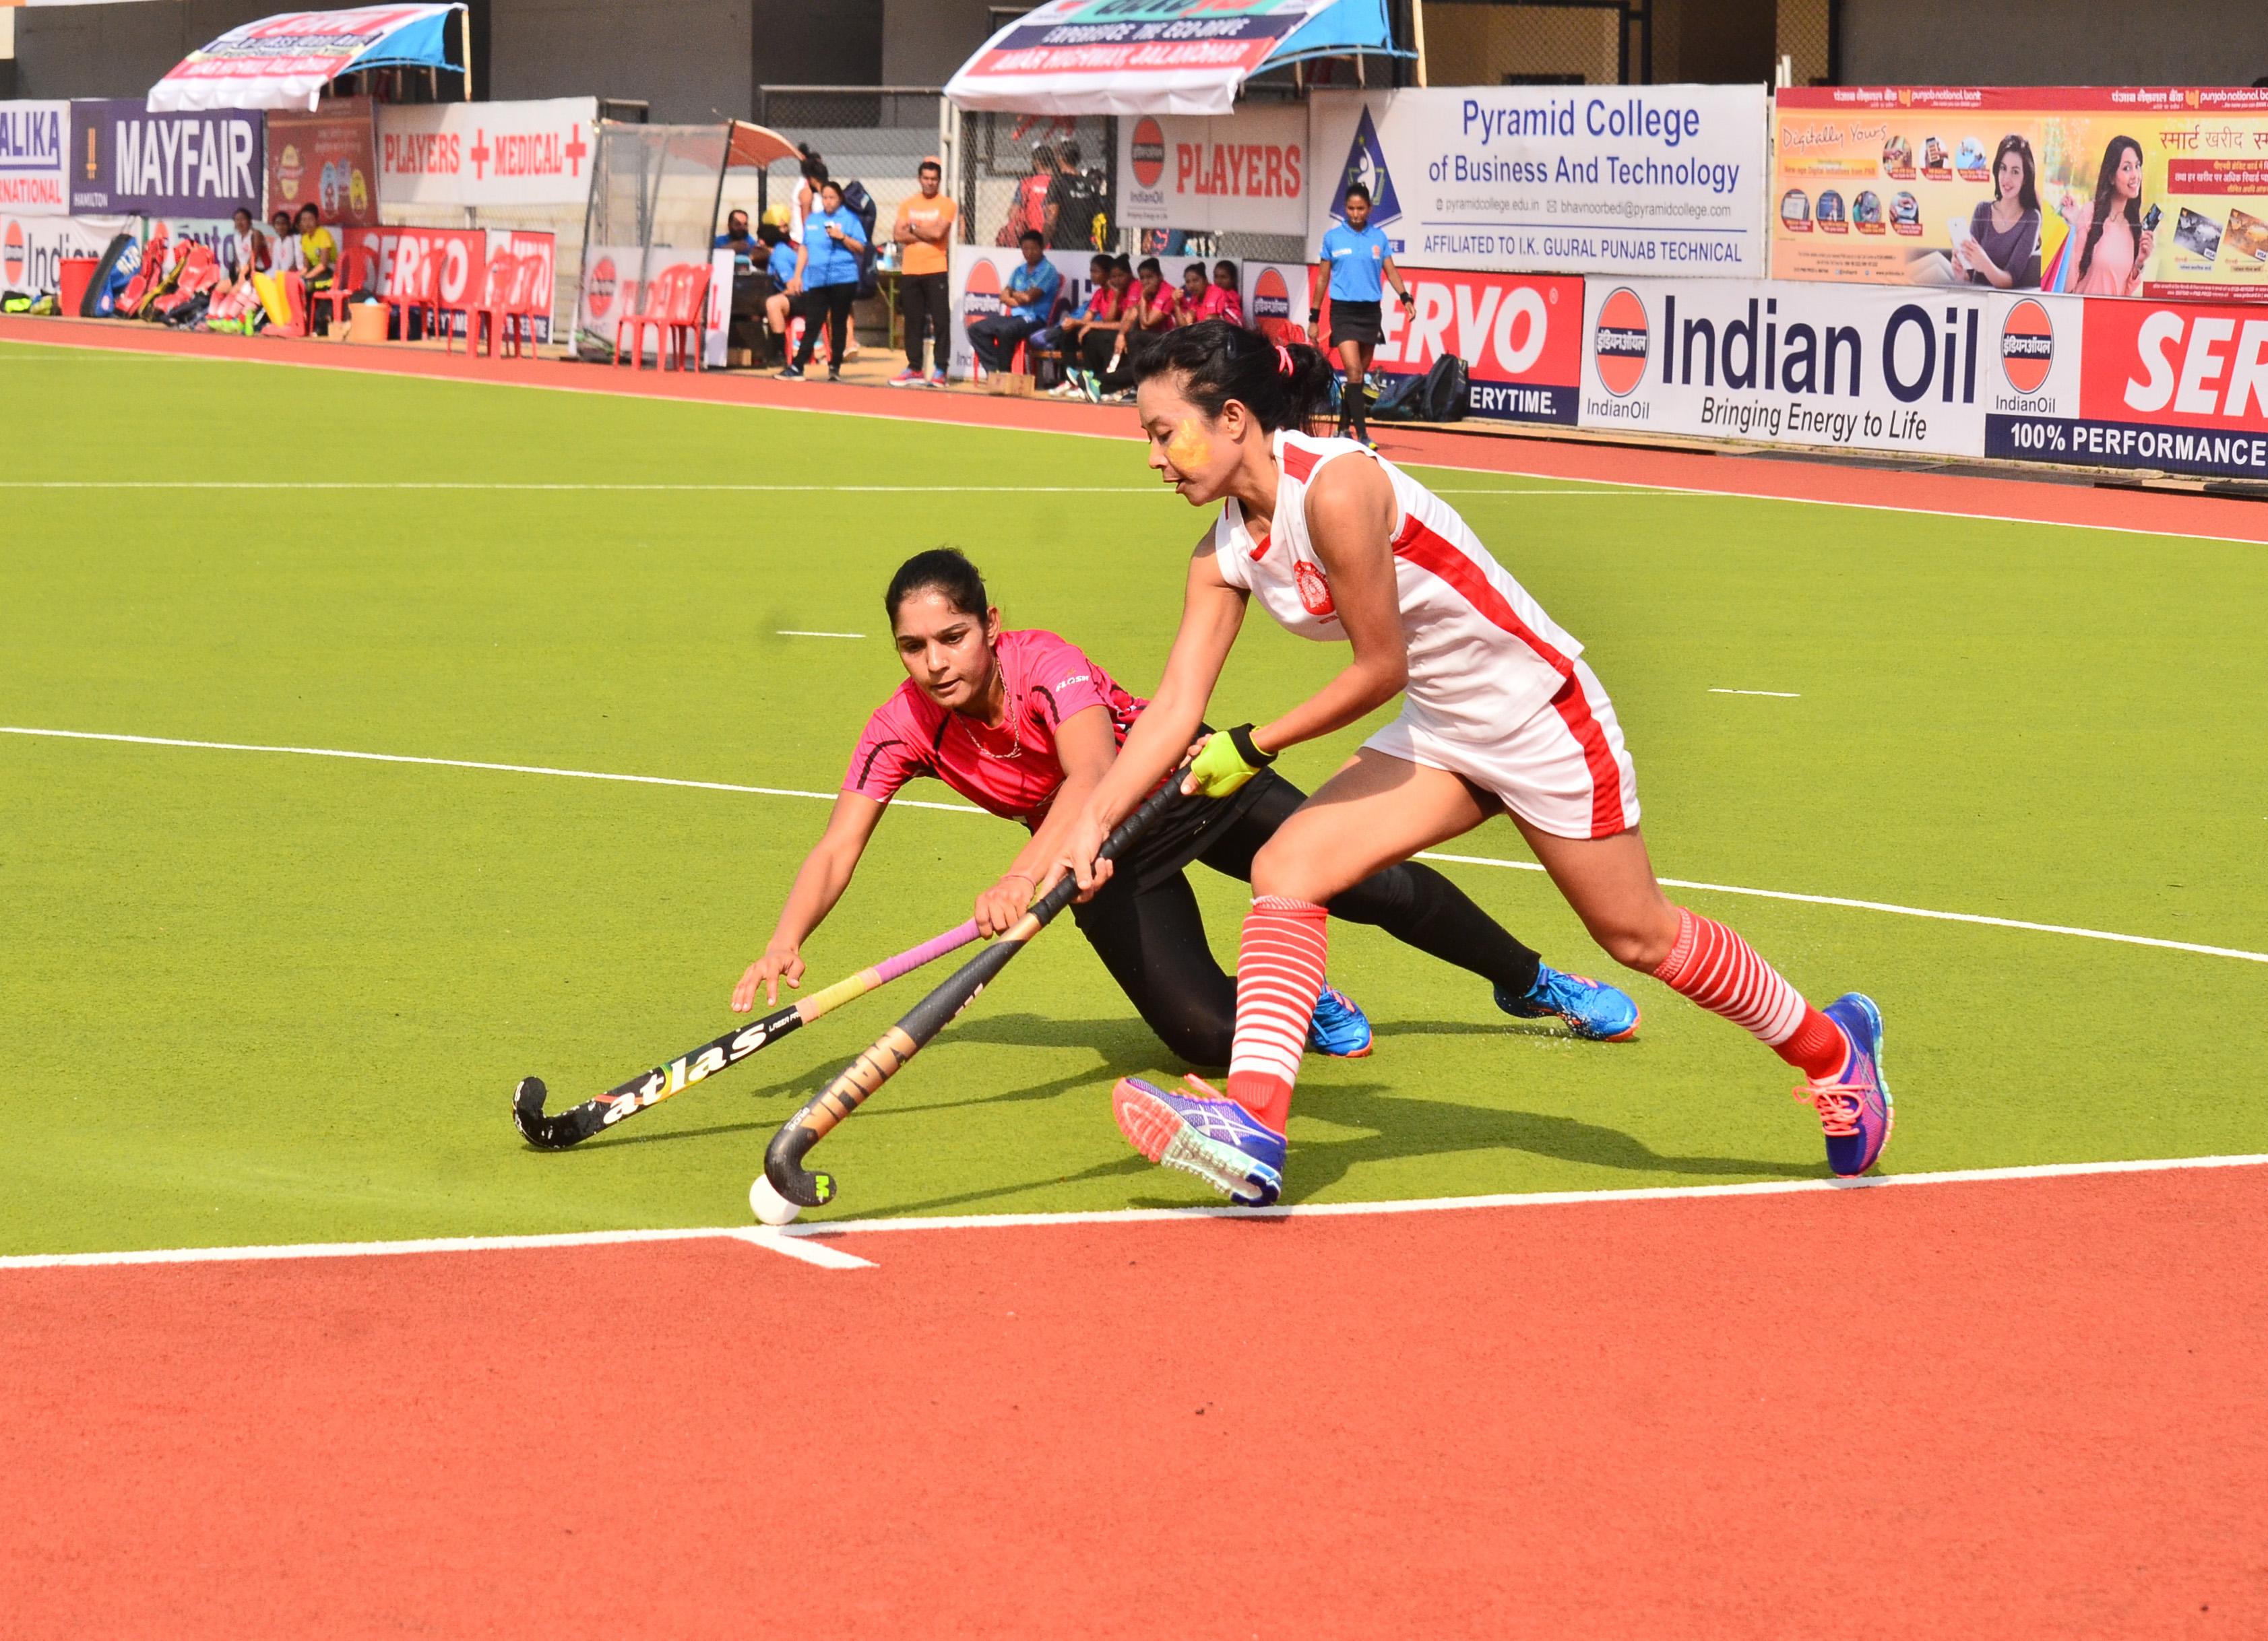 34th Indian Oil Servo Surjit Hockey Tournament